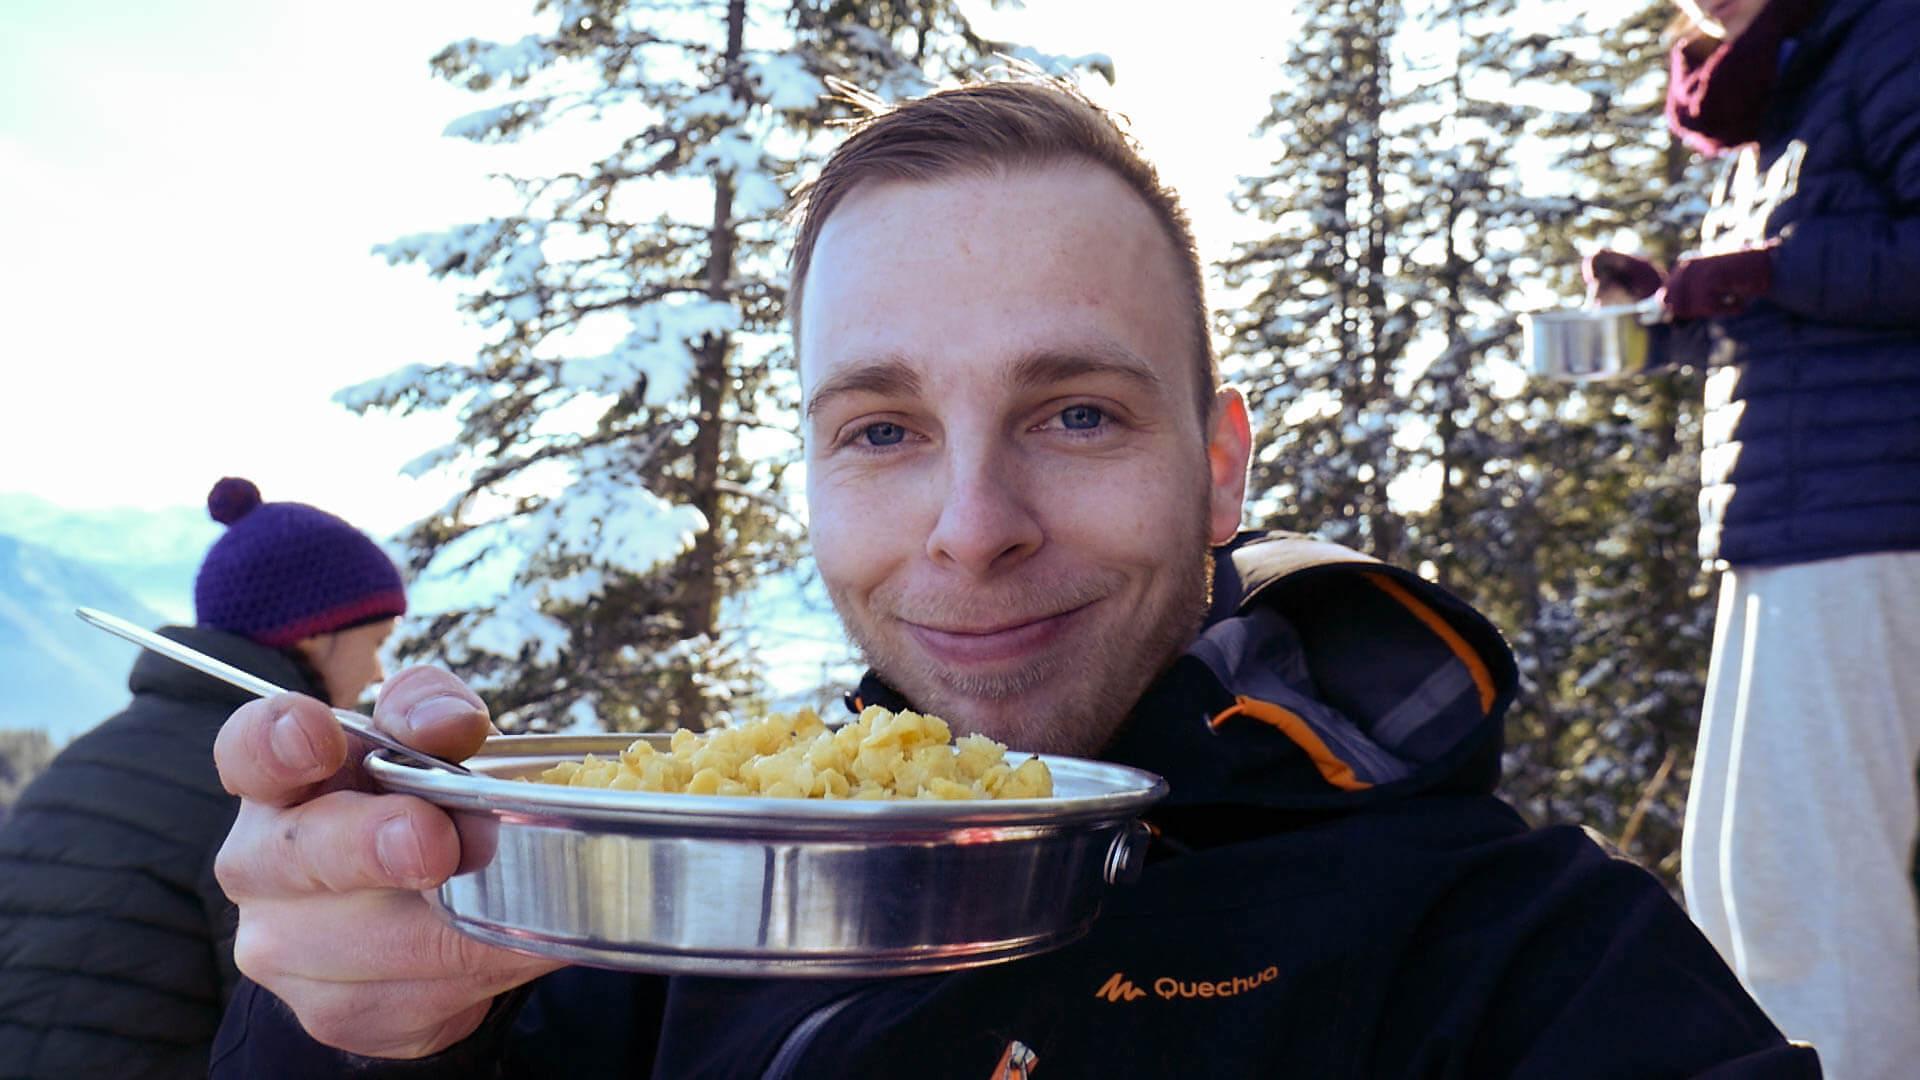 Markus isst Kässspätle auf dem Ettaler Mandl